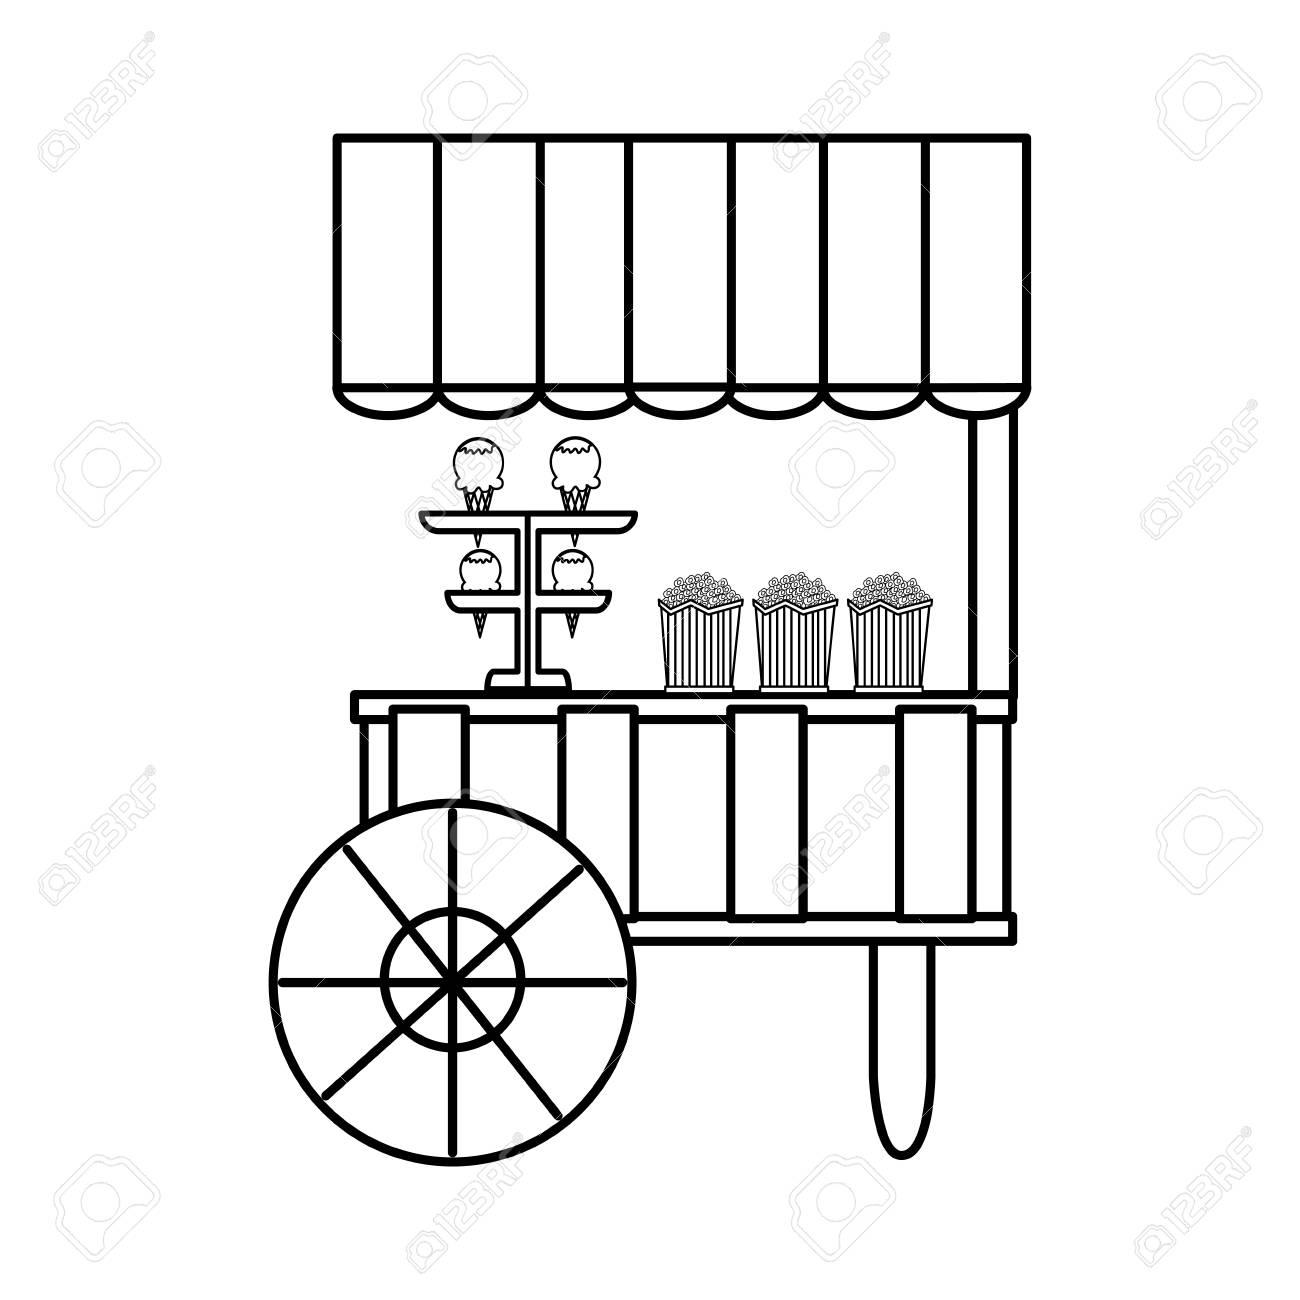 Shop Cart Popcorn And Ice Cream Carnival Vector Illustration